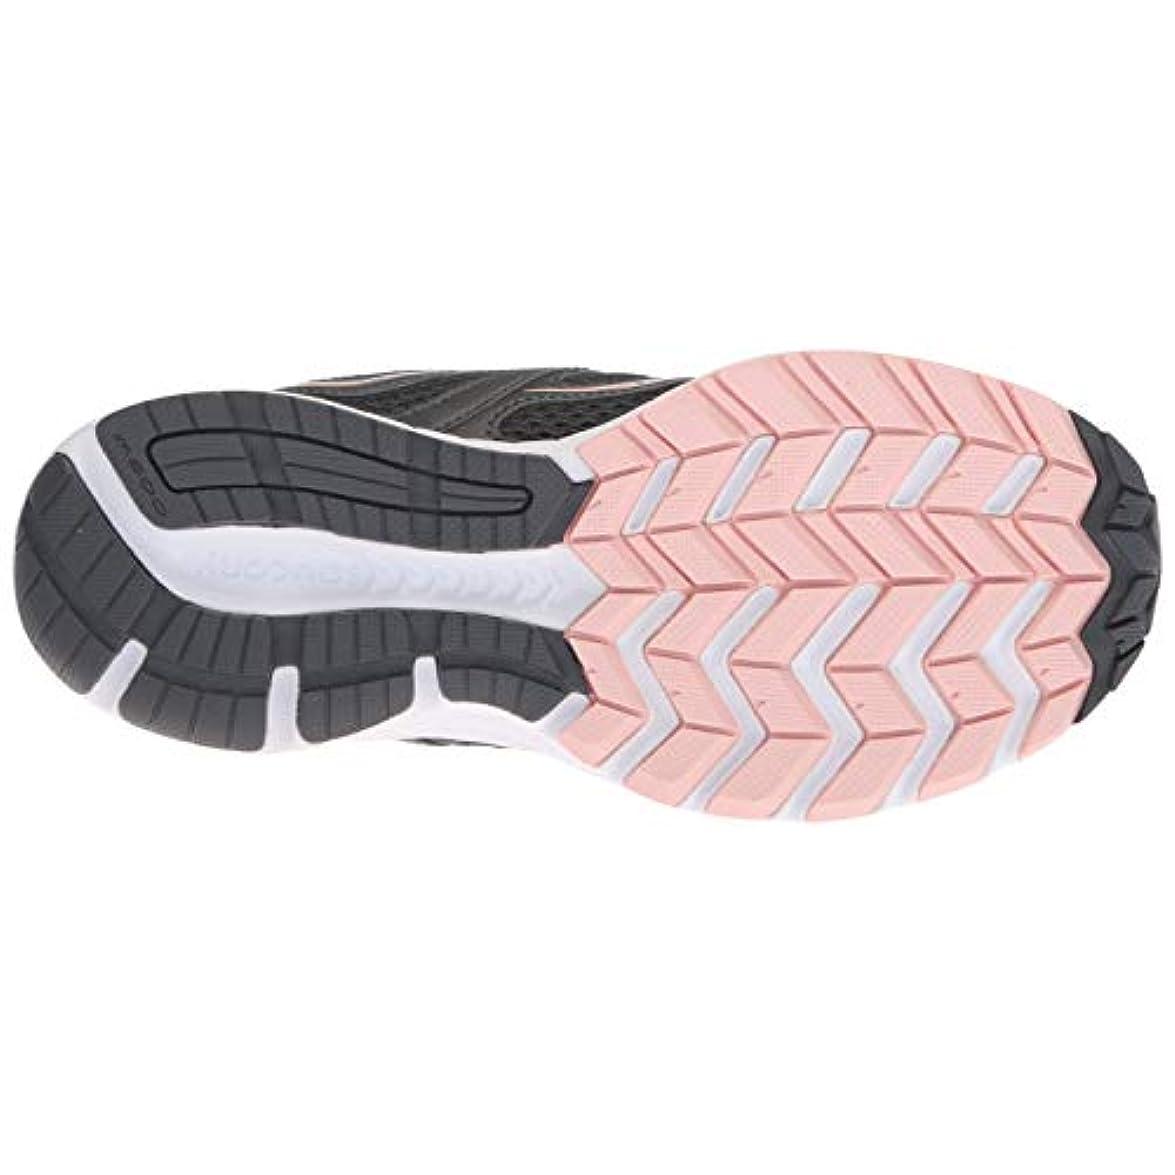 Saucony Cohesion 11 Scarpe Da Fitness Donna